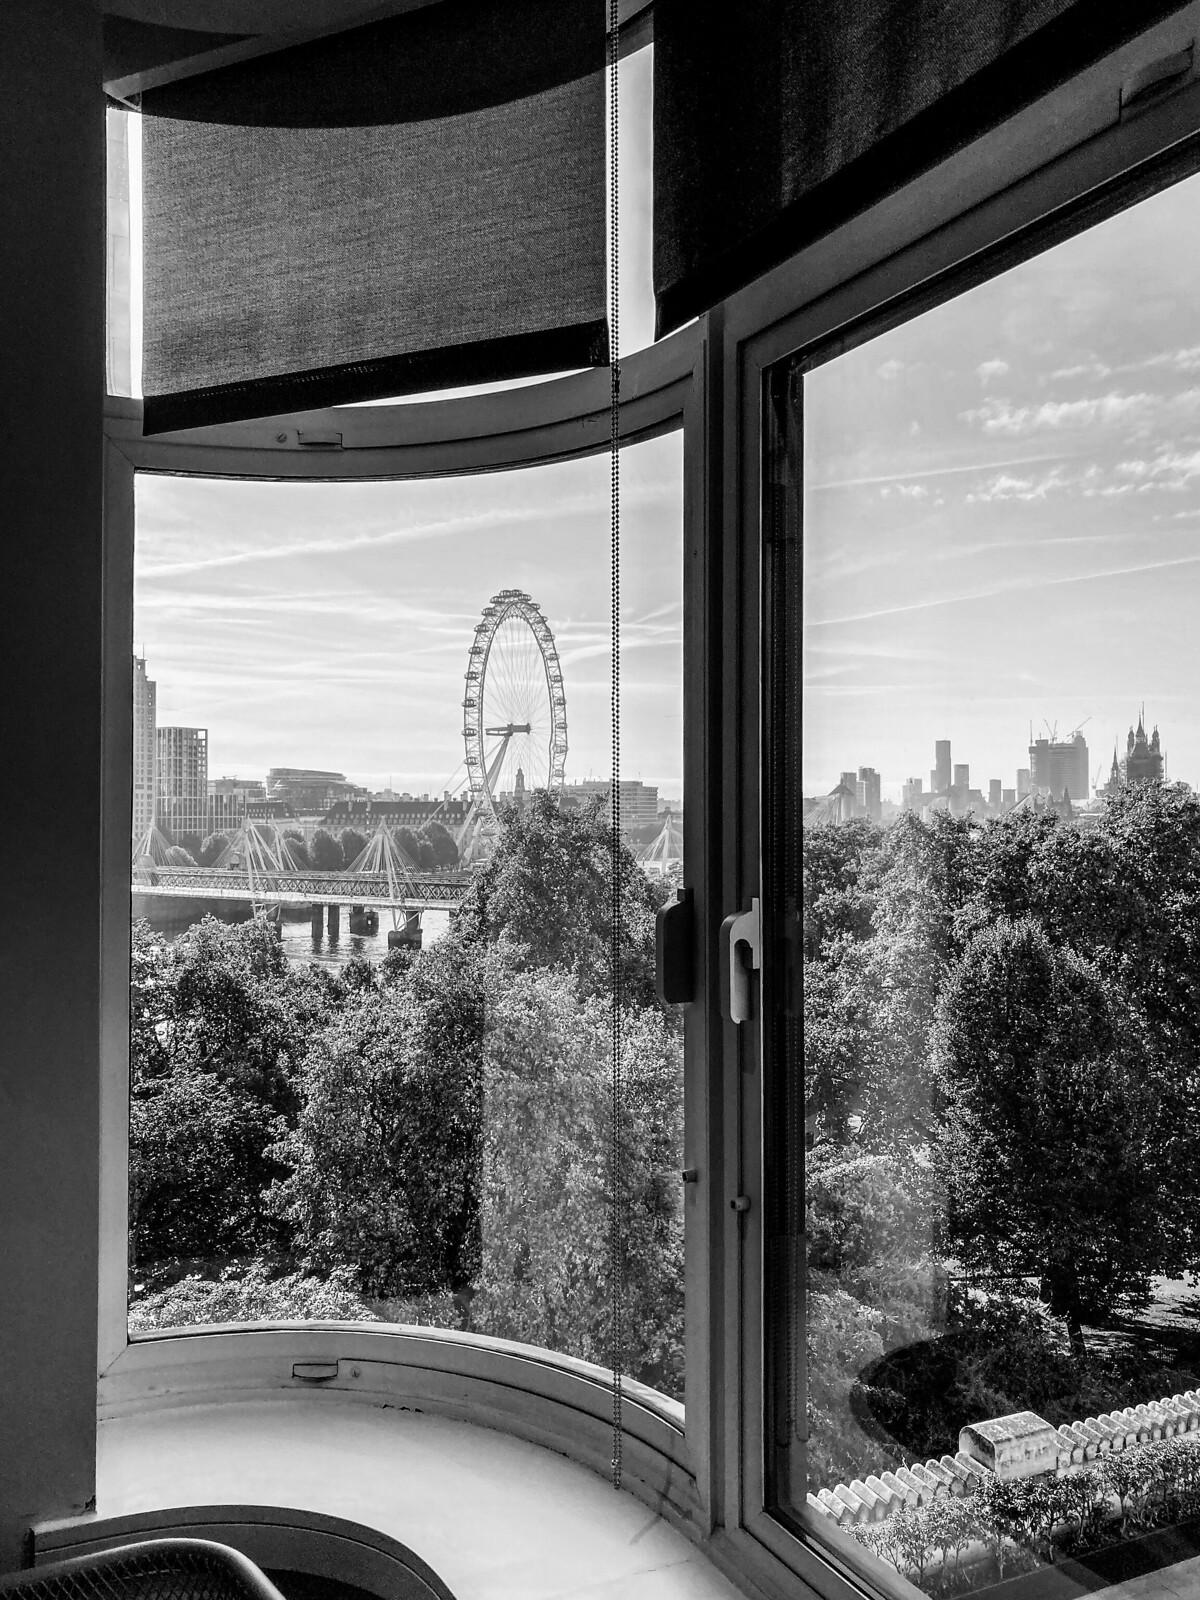 Office views